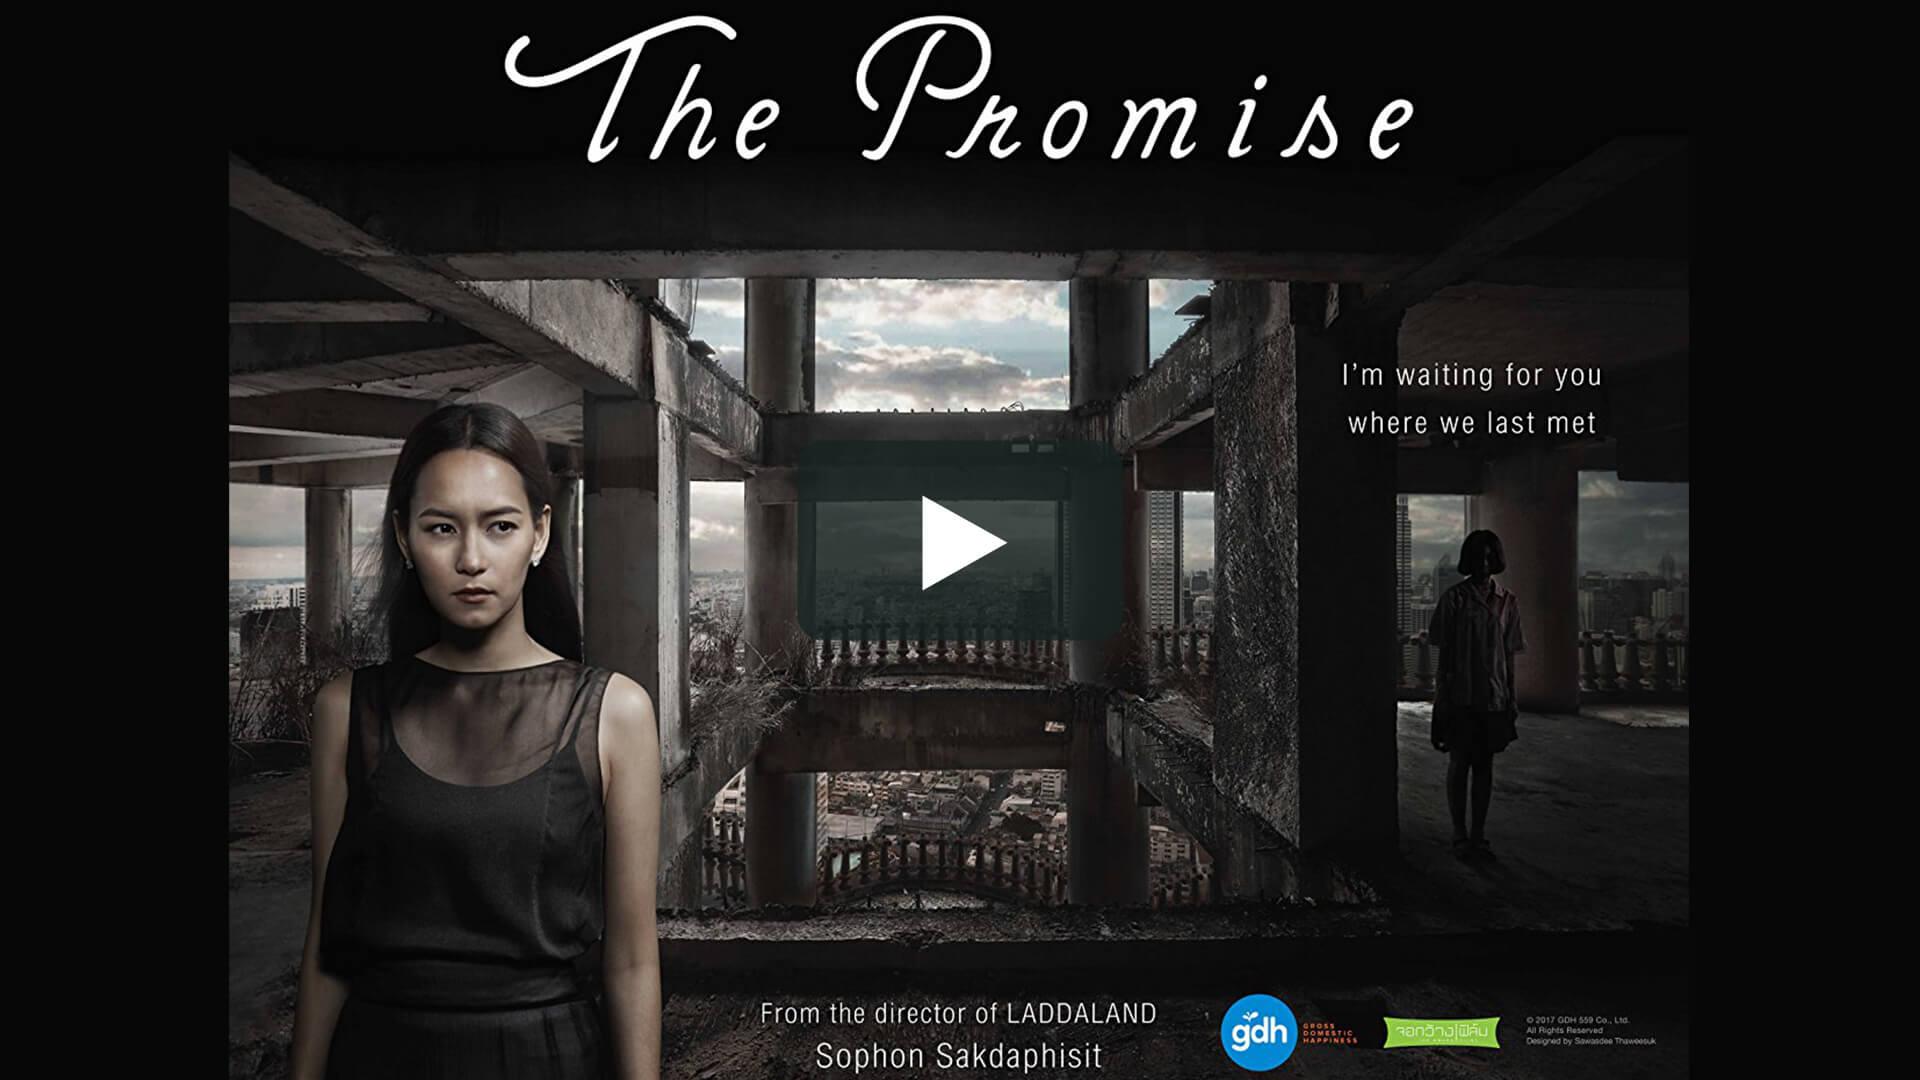 承諾 - The Promise